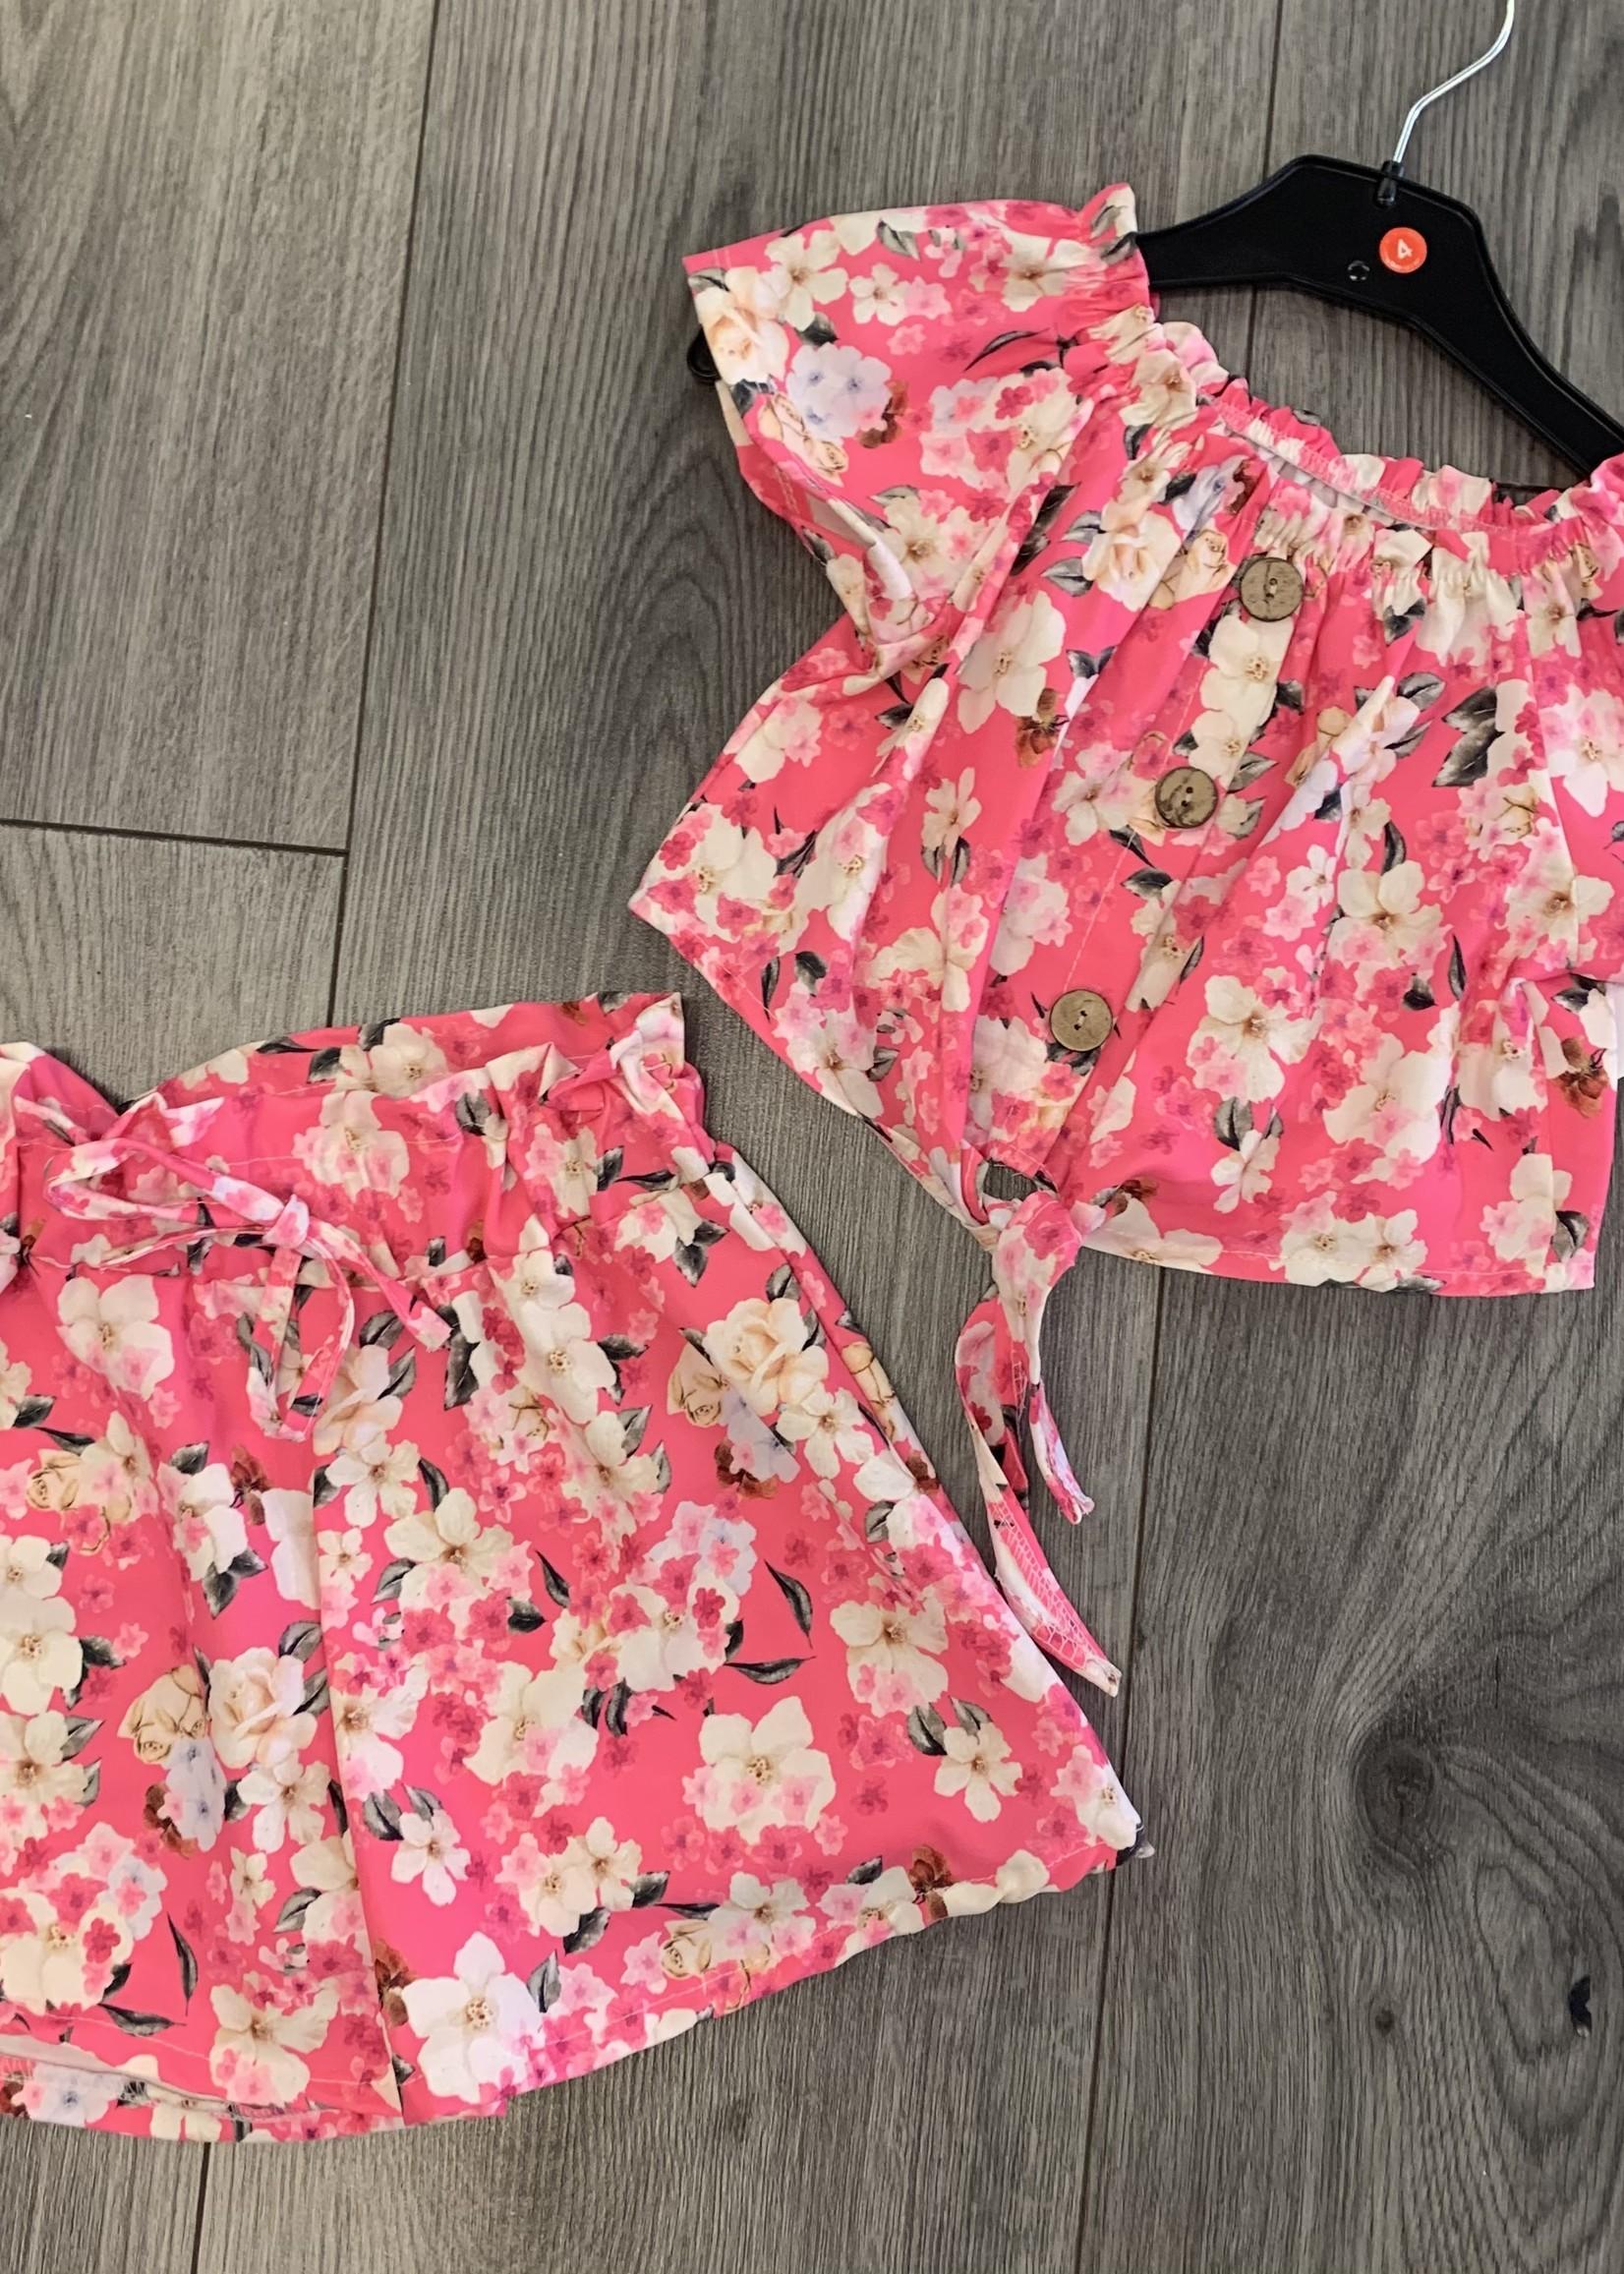 Divanis Divanis pink flower set